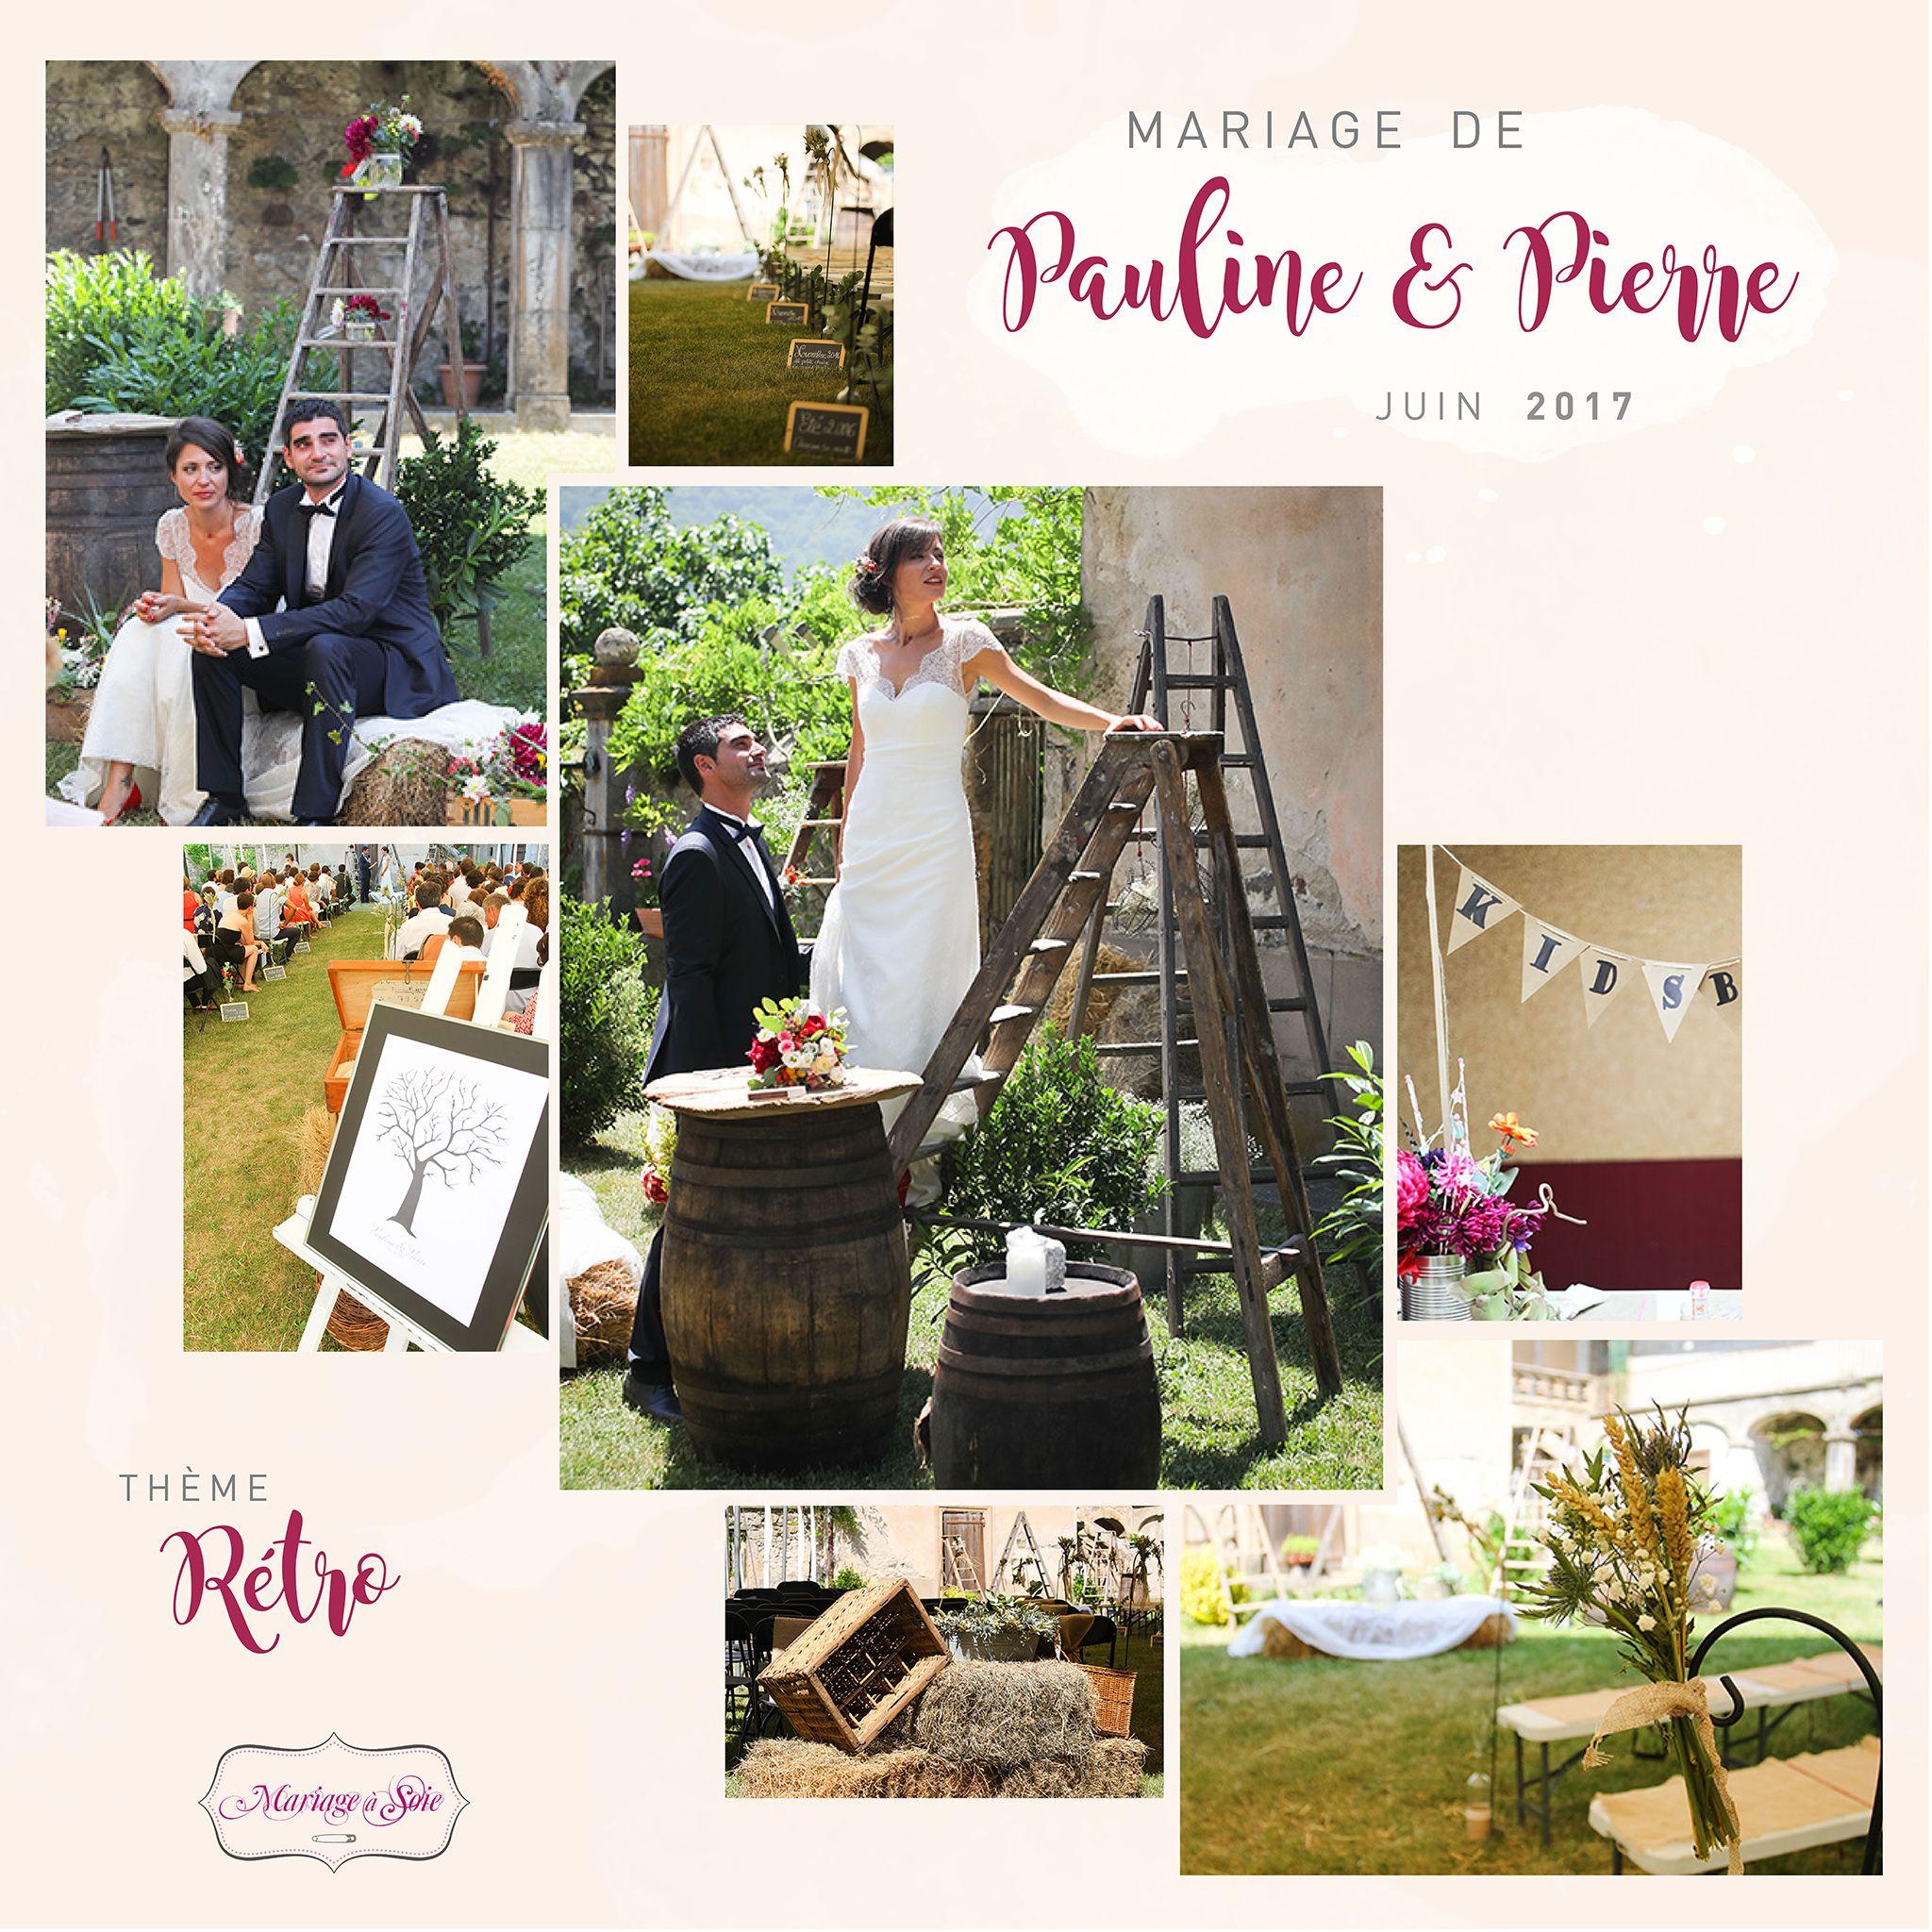 Mariage  Soie Décoration & organisation mariage th¨me retro